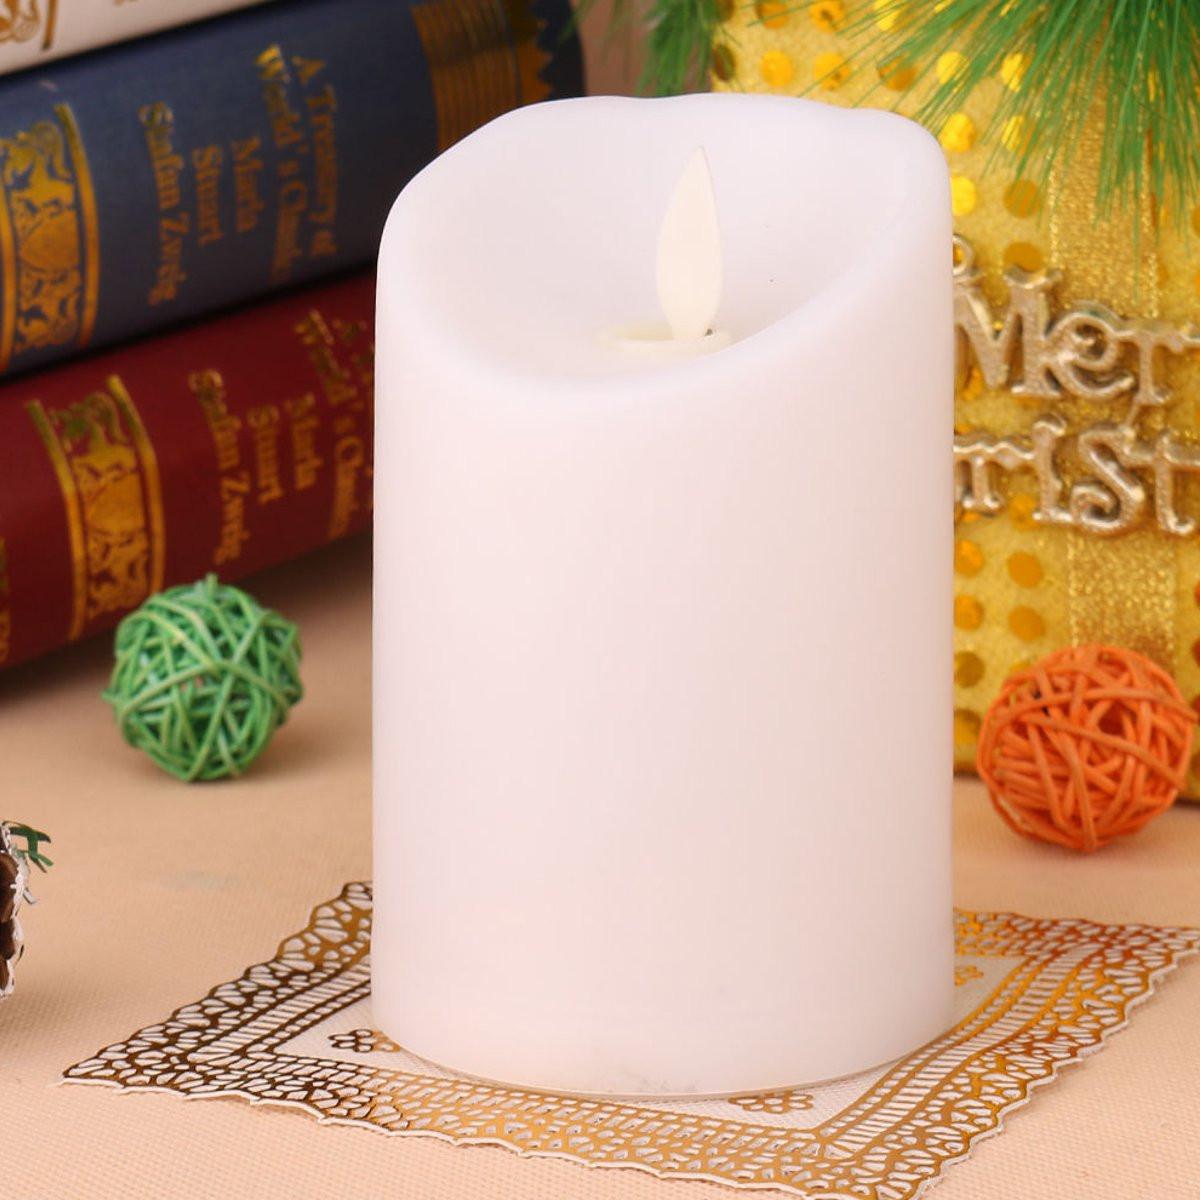 Romantic Electronic LED Flameless Flickering Simulation Candle Night Light  11 5*7 5cm